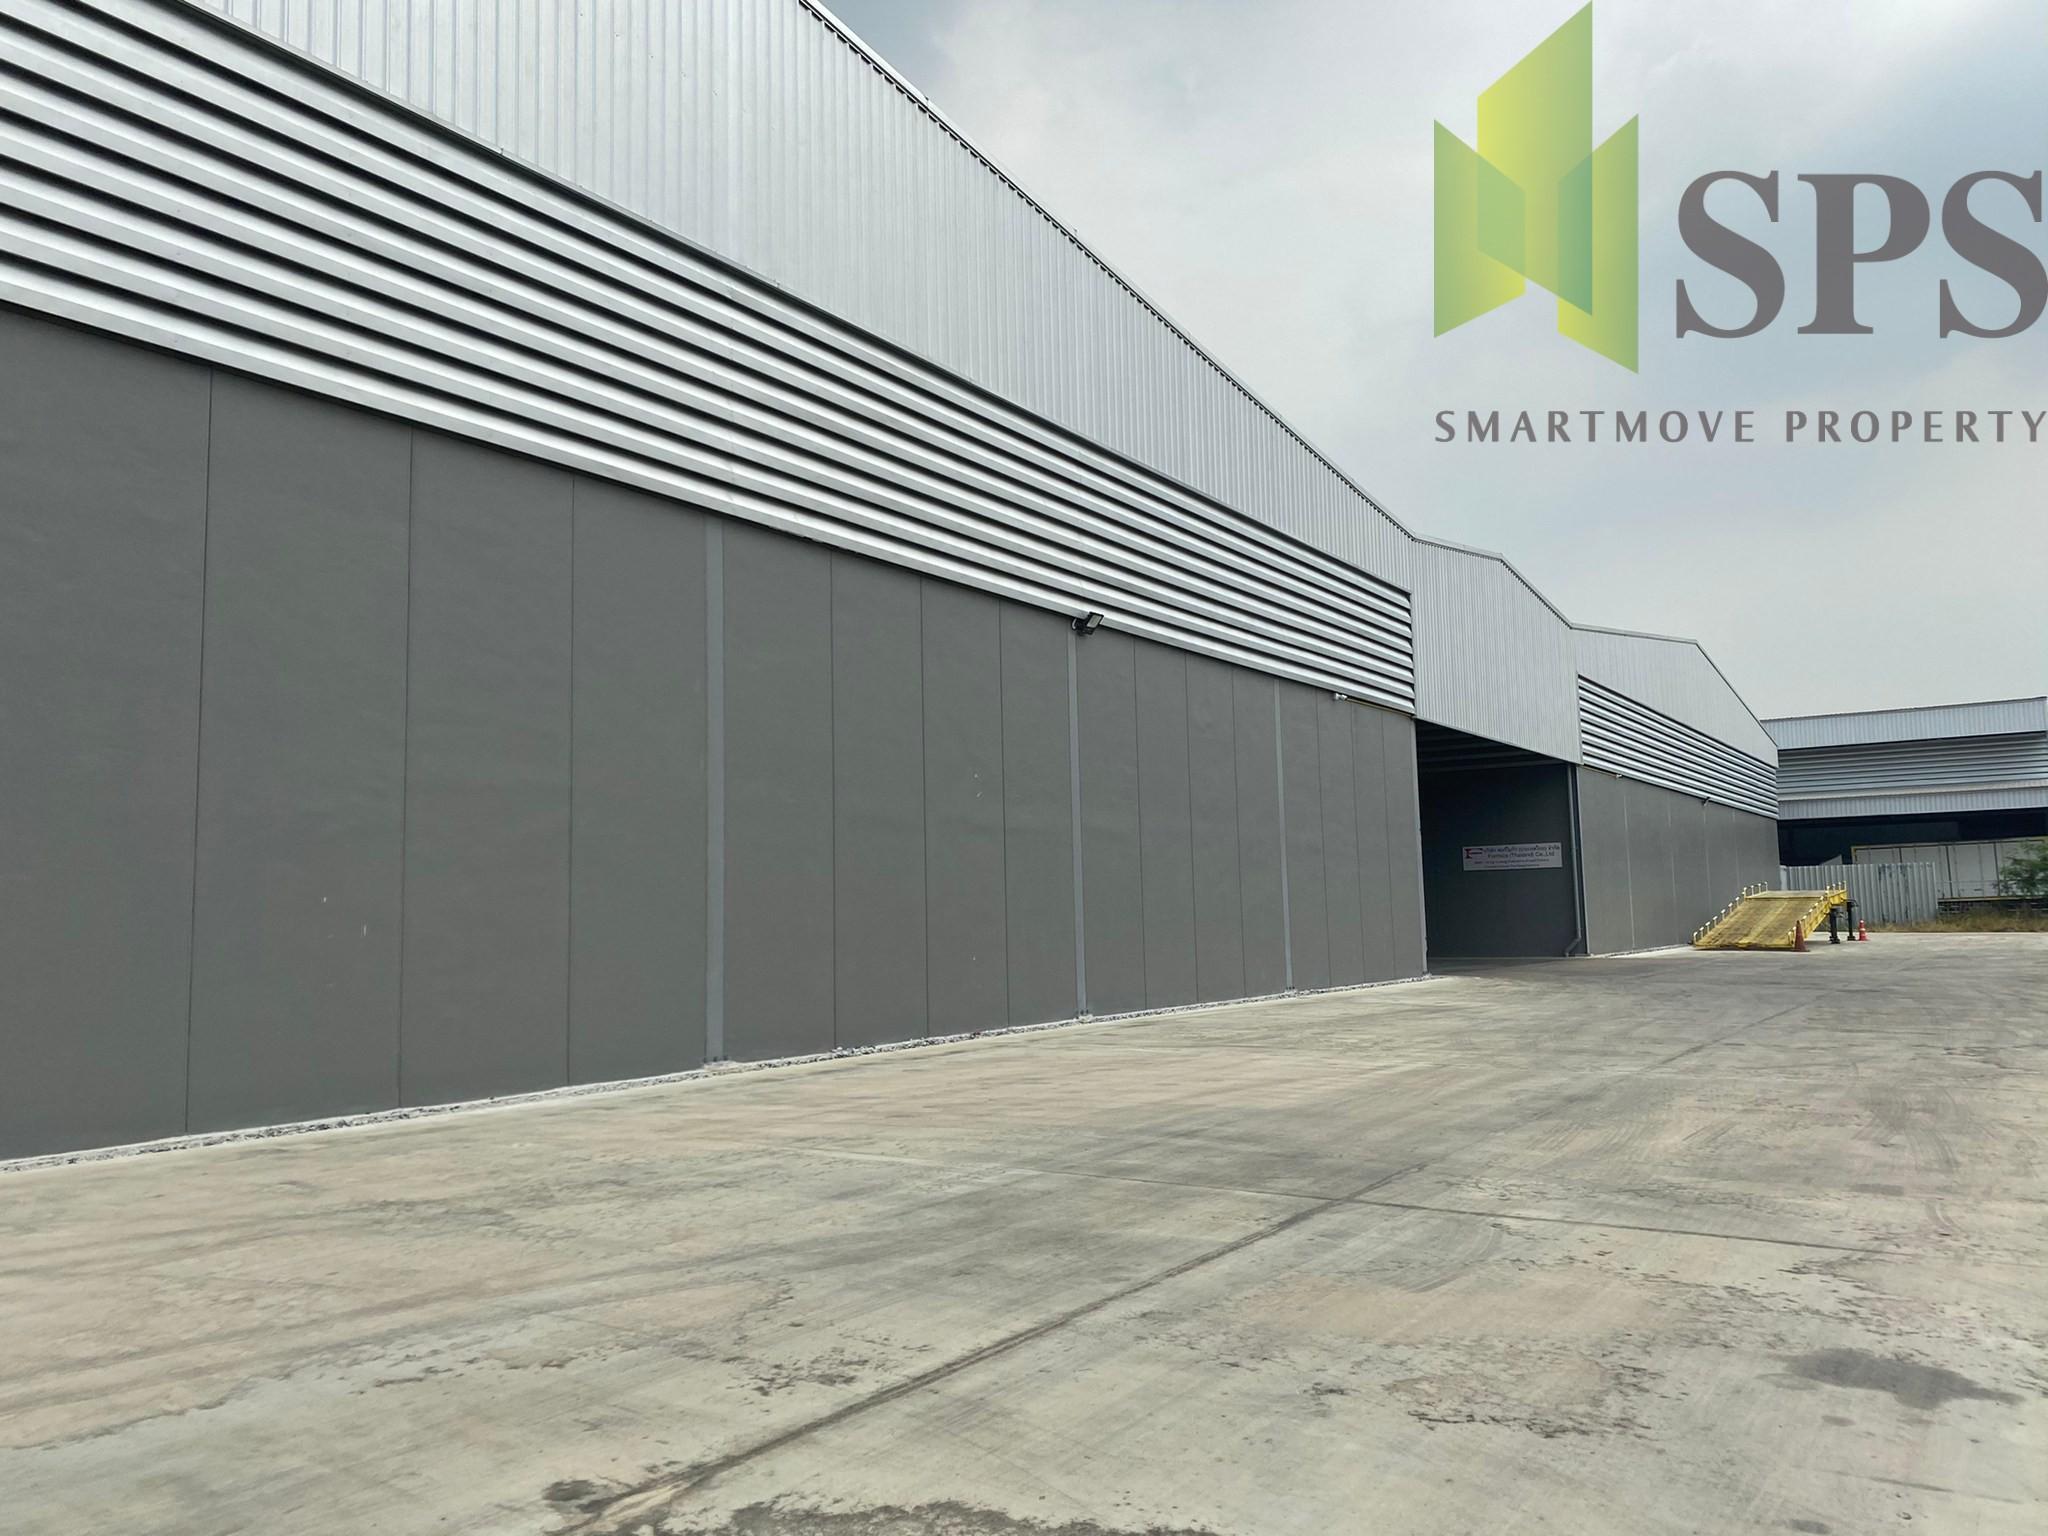 Factory/Warehouse for RENT at Samrong Klang, Phra Pradaeng District, Samut Prakan/ โรงงาน /โกดัง สำหรับเช่า ที่ สำโรงกลาง พระประแดง สมุทรปราการ(Property ID: SPS-PPW166)